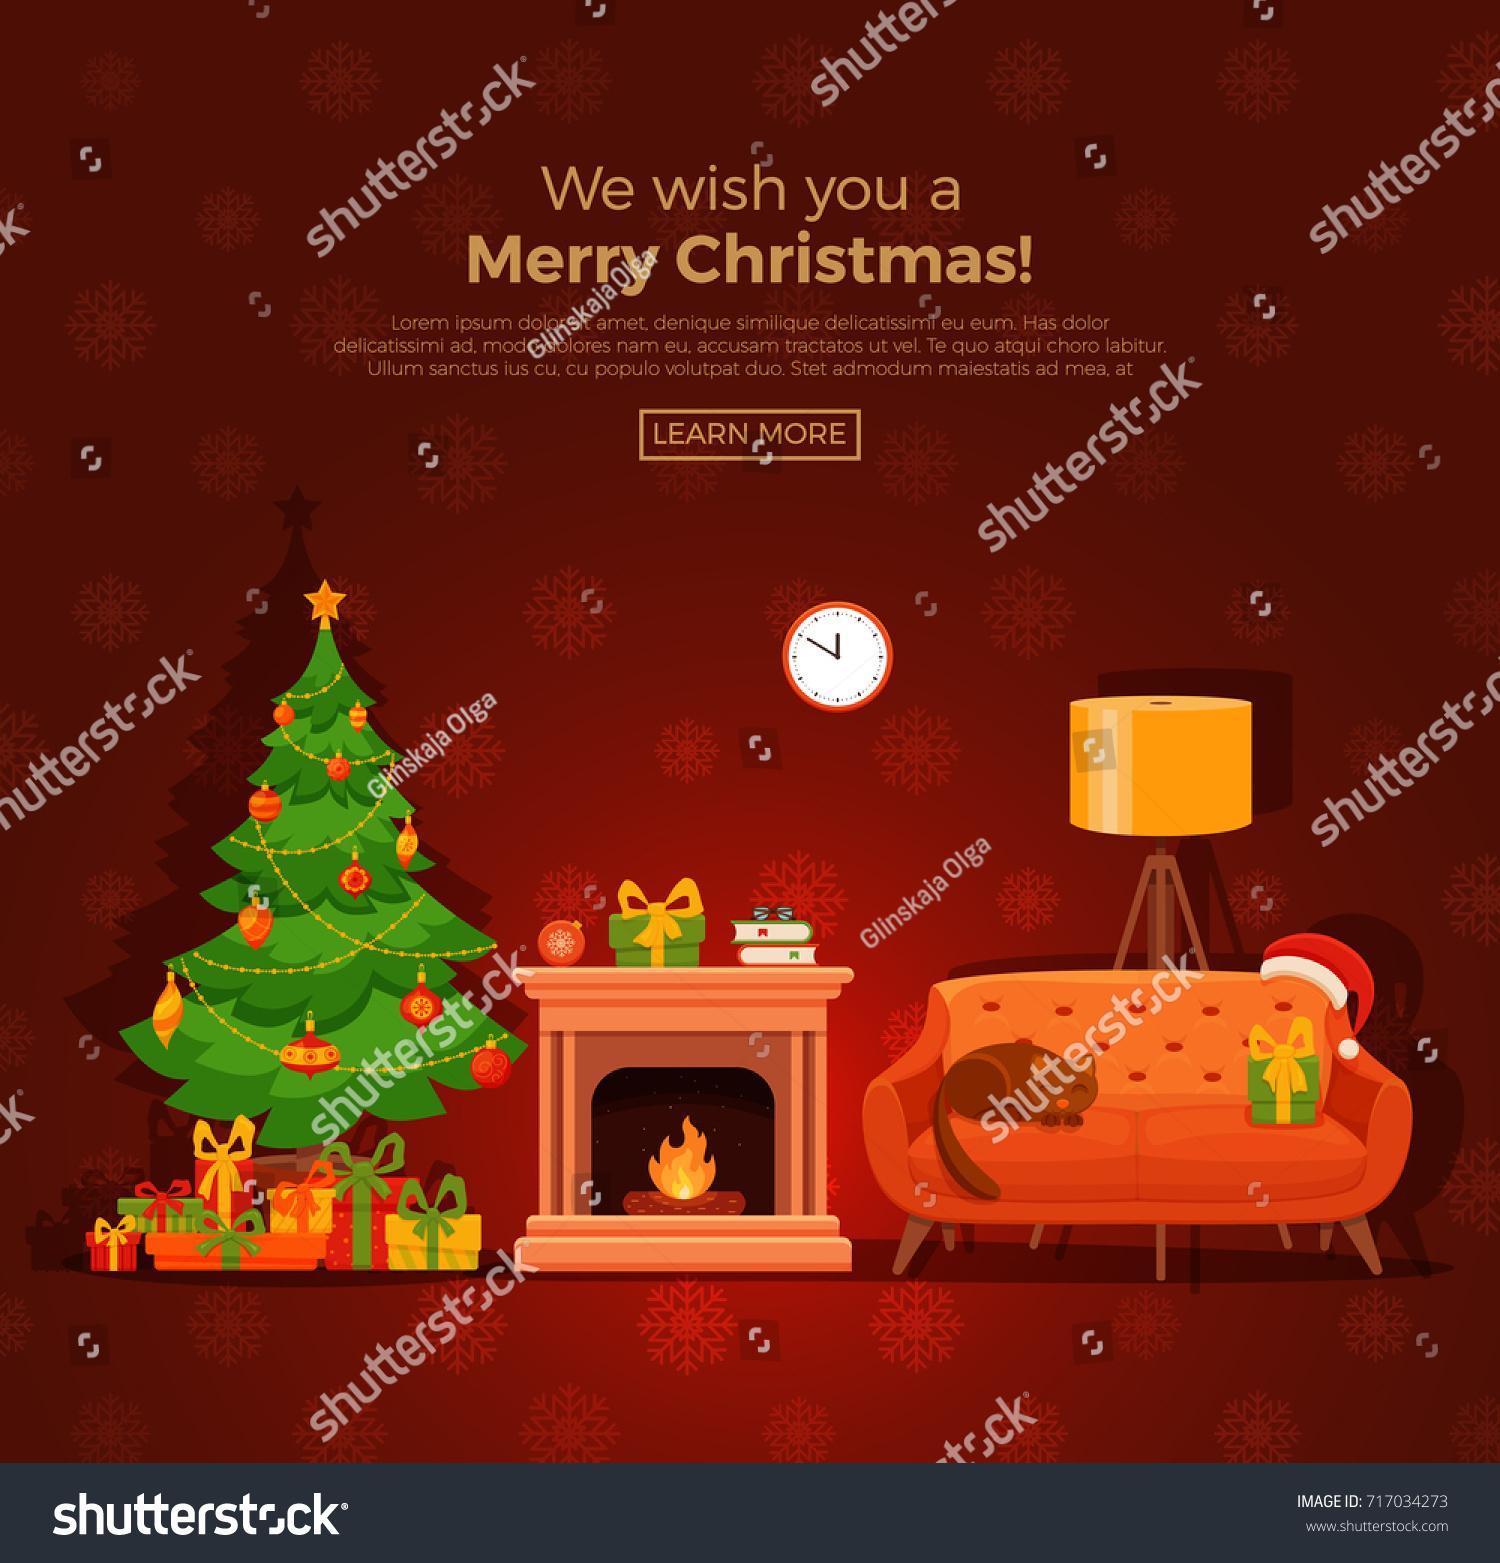 Christmas Room Stock Vector Image Of Illuminated: Christmas Fireplace Room Interior Colorful Cartoon Stock